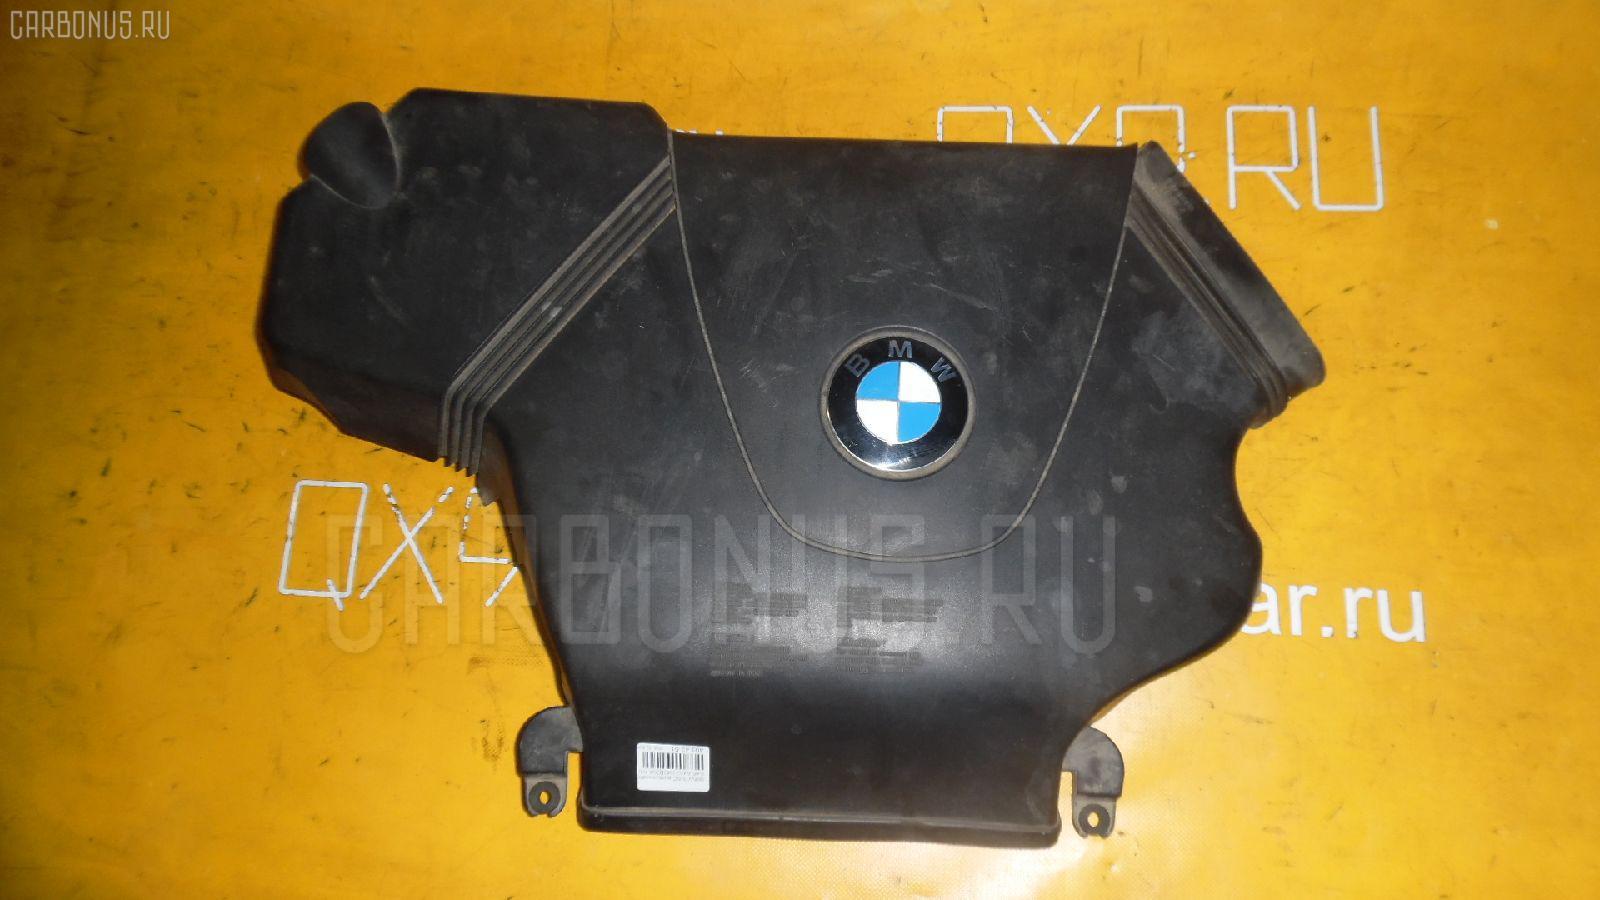 Воздухозаборник BMW 3-SERIES E46-AX52 N42B20A Фото 2